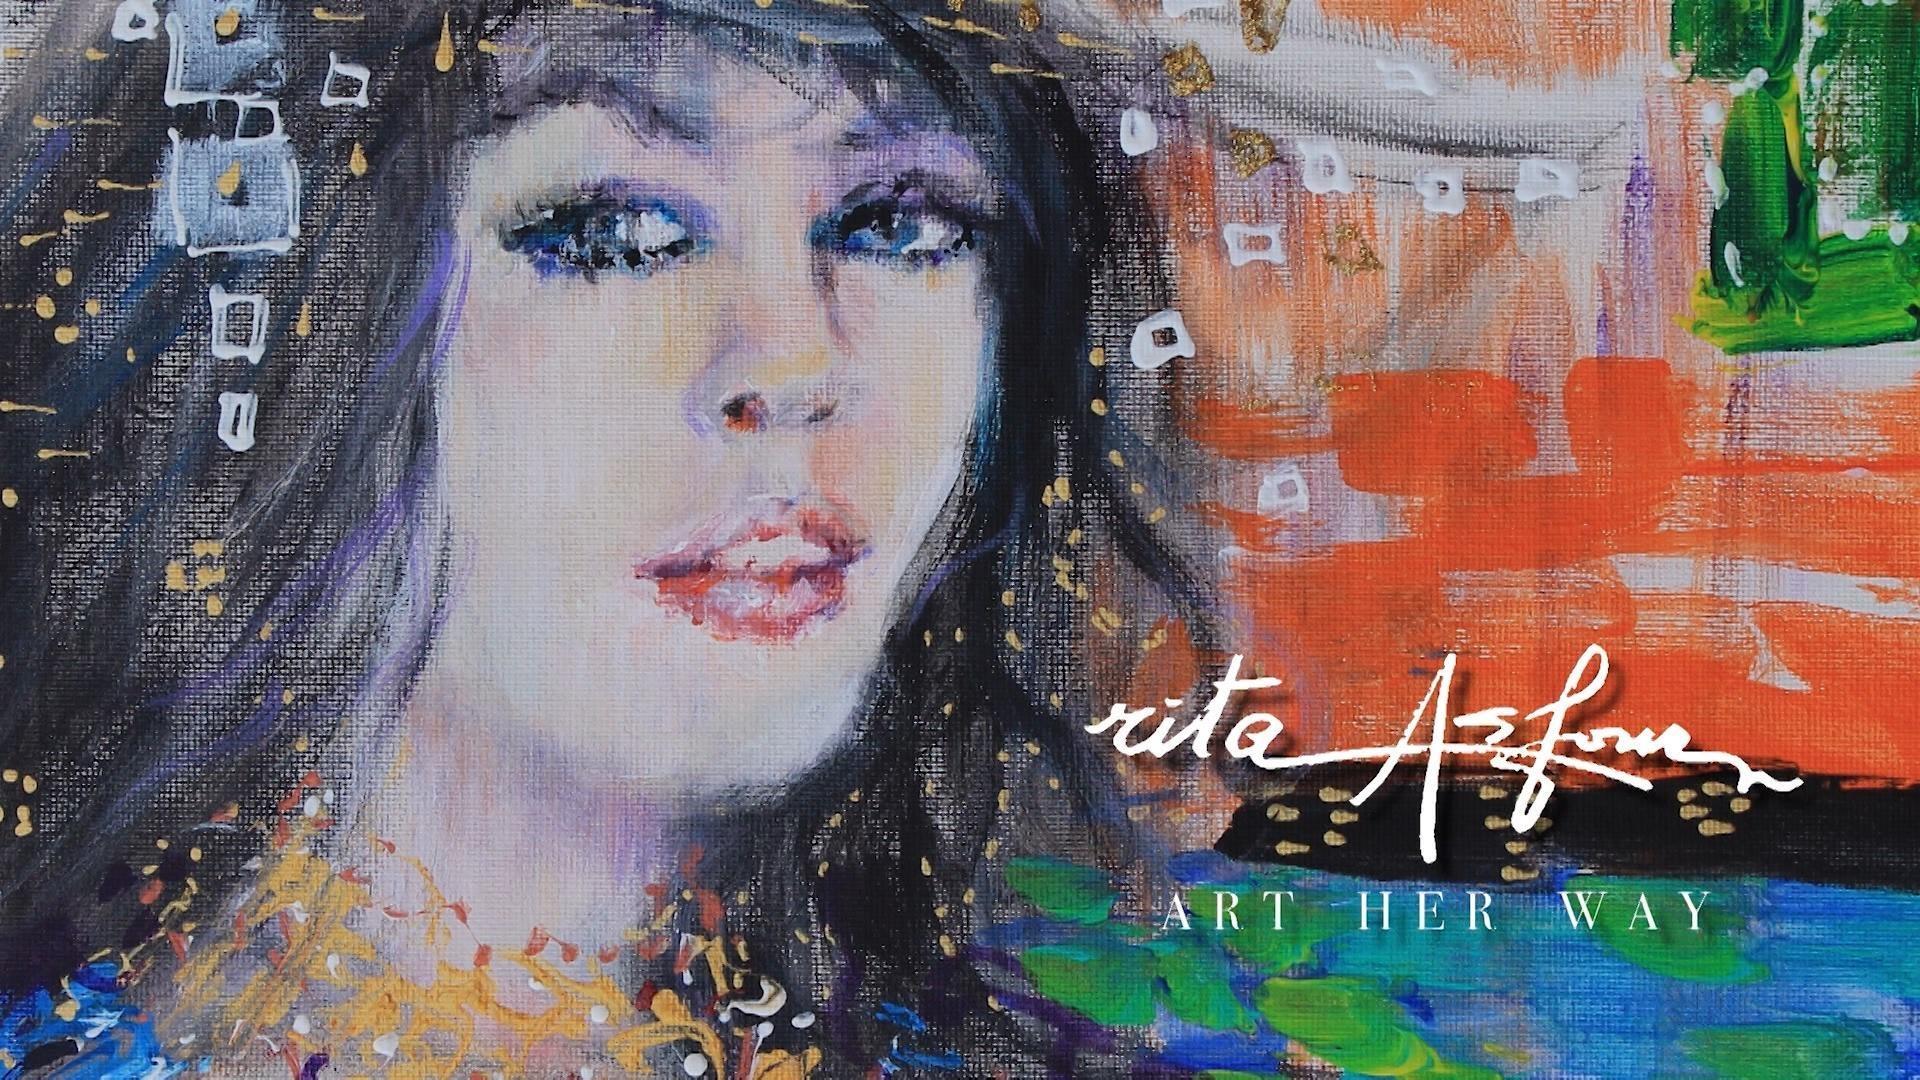 Rita Asfour: Art Her Way